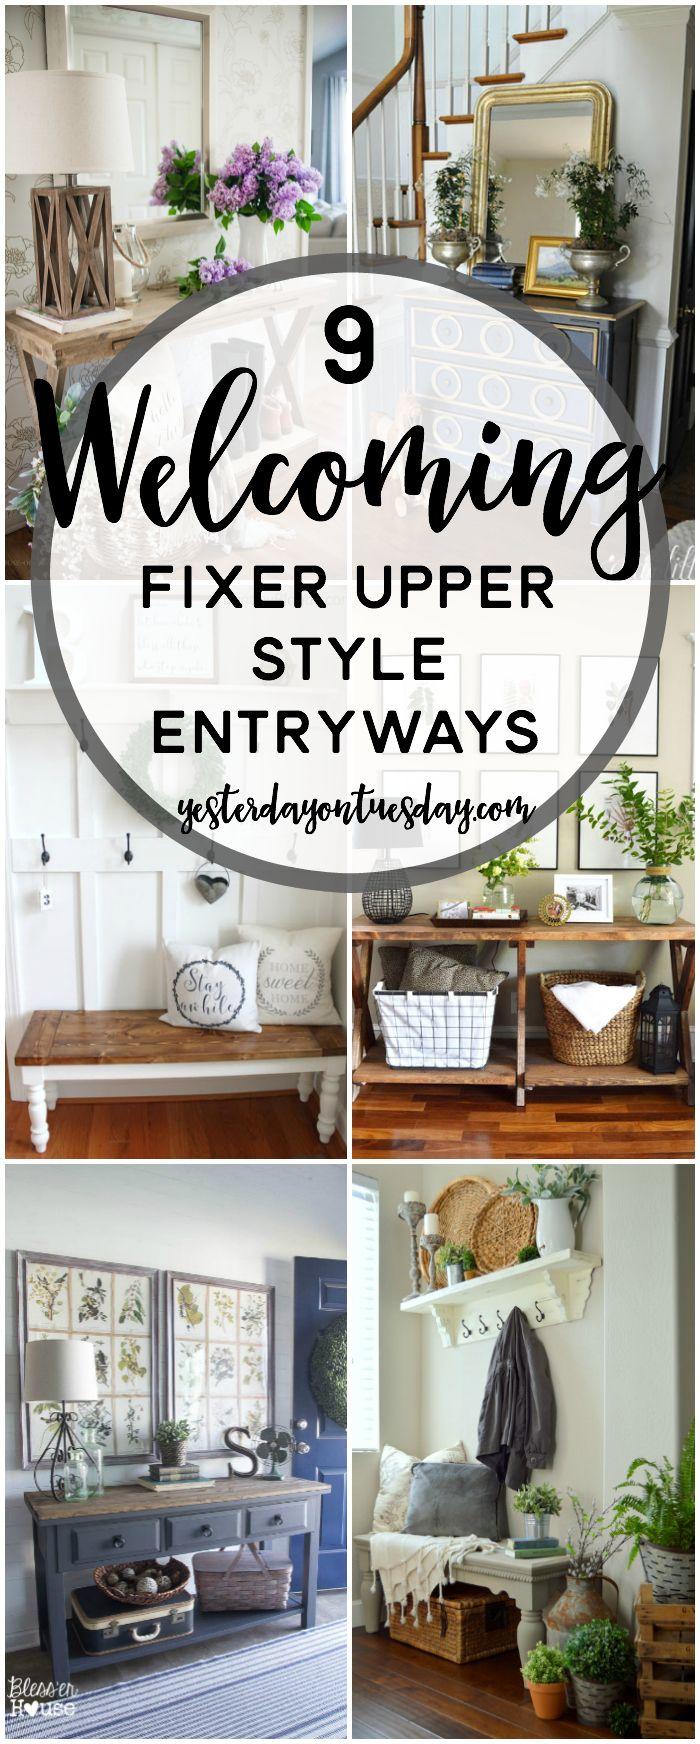 9 Cozy Fixer Upper Style Entryways | My safe place | Pinterest ...